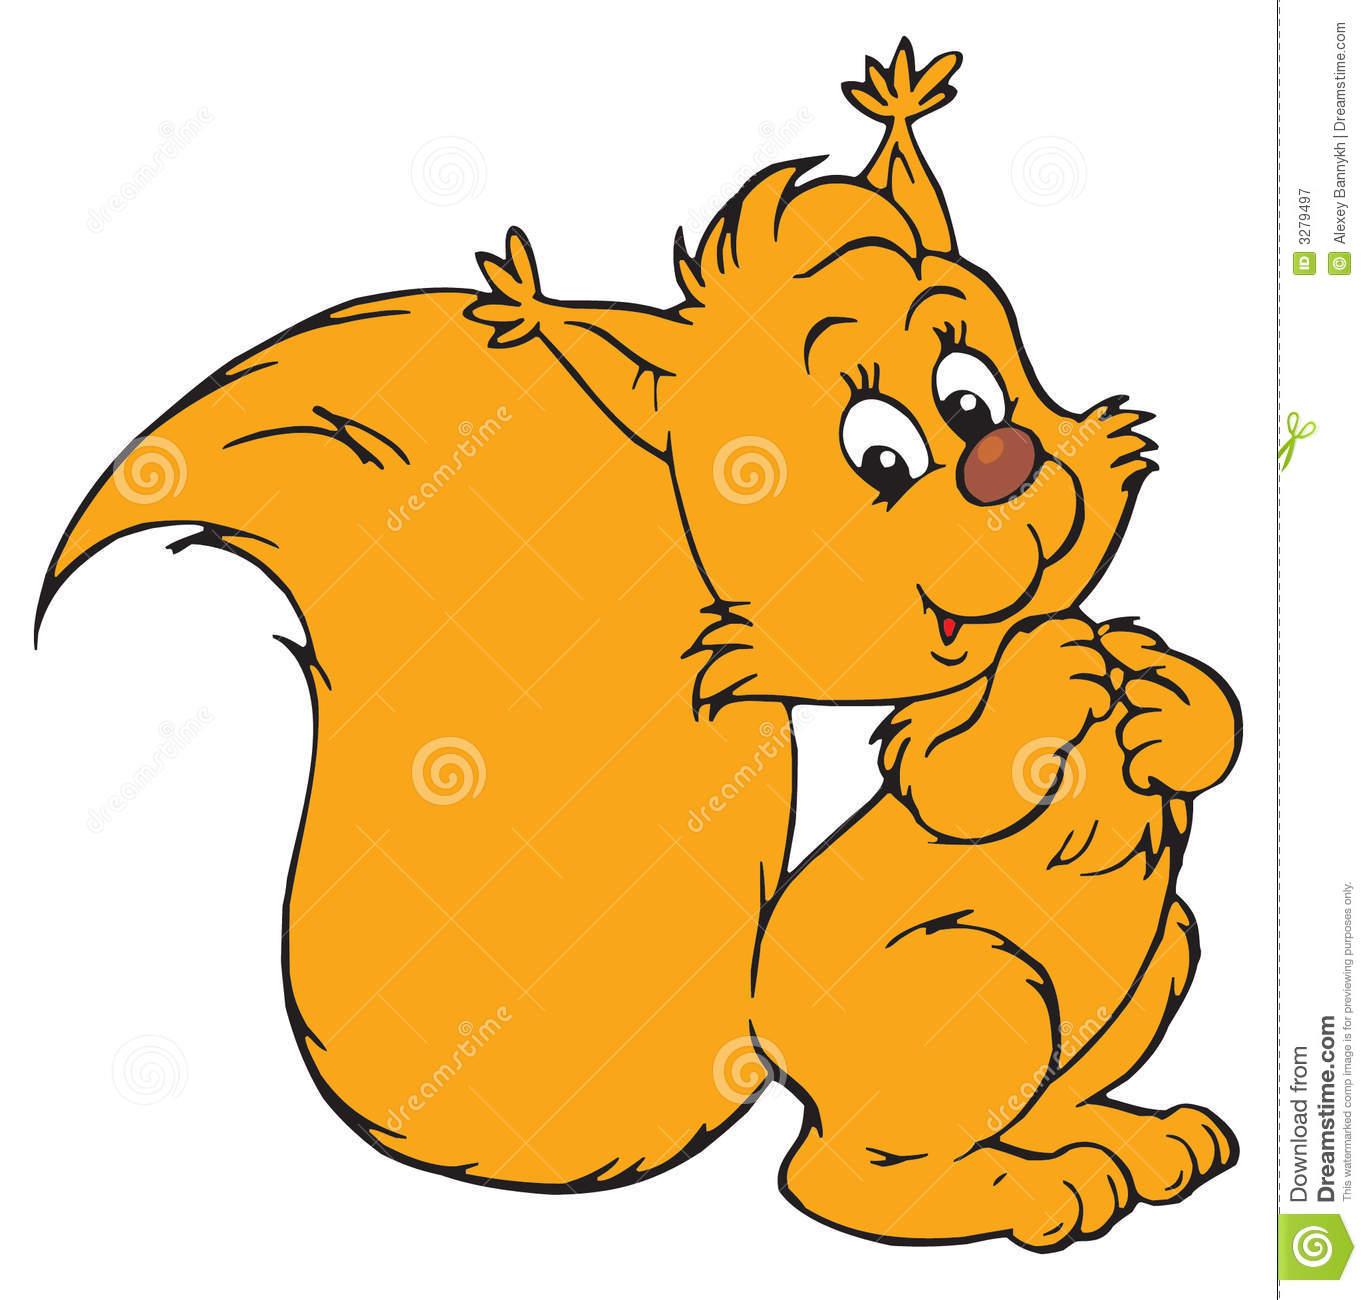 Cute Cartoon Squirrel Royalty Free Stock Photography.